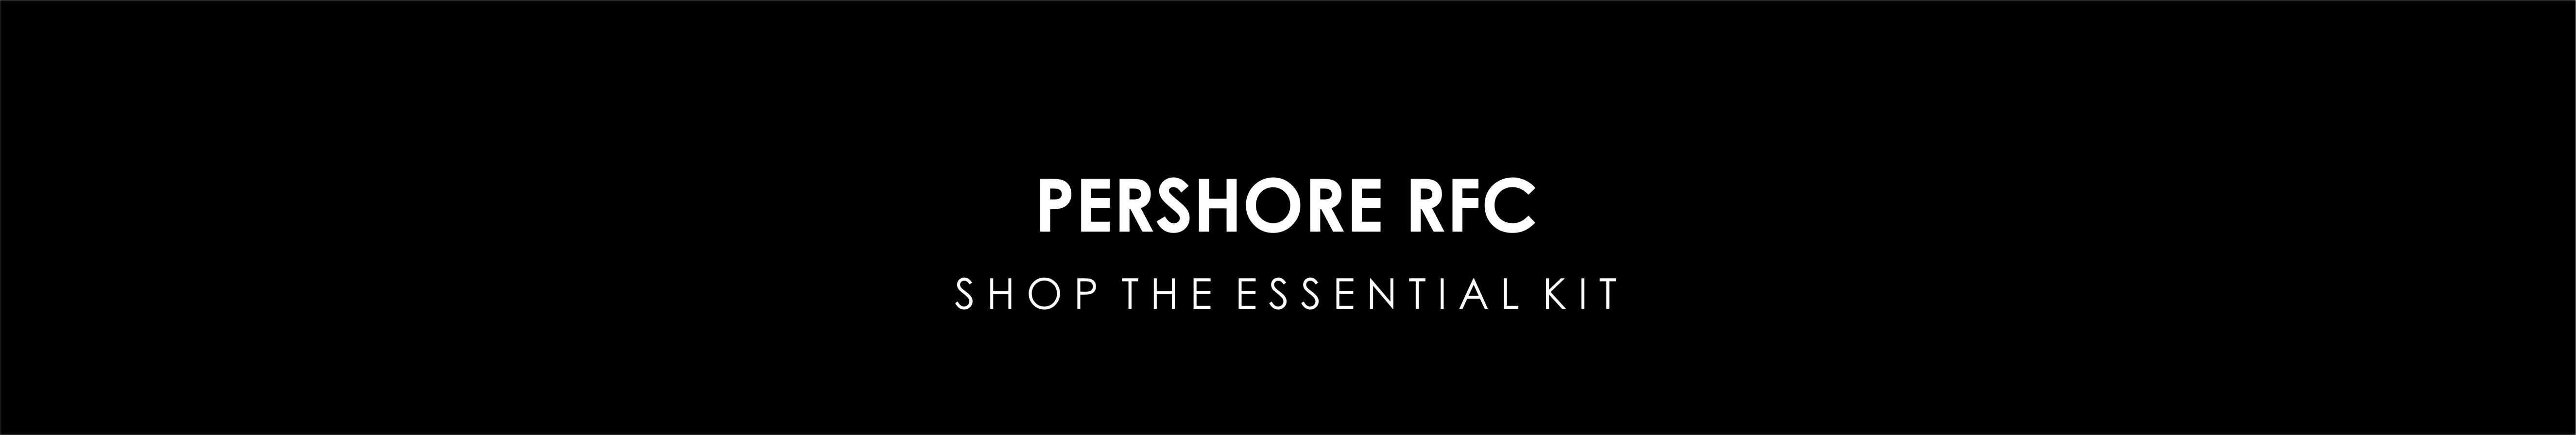 pershore-rfc-banner.jpg